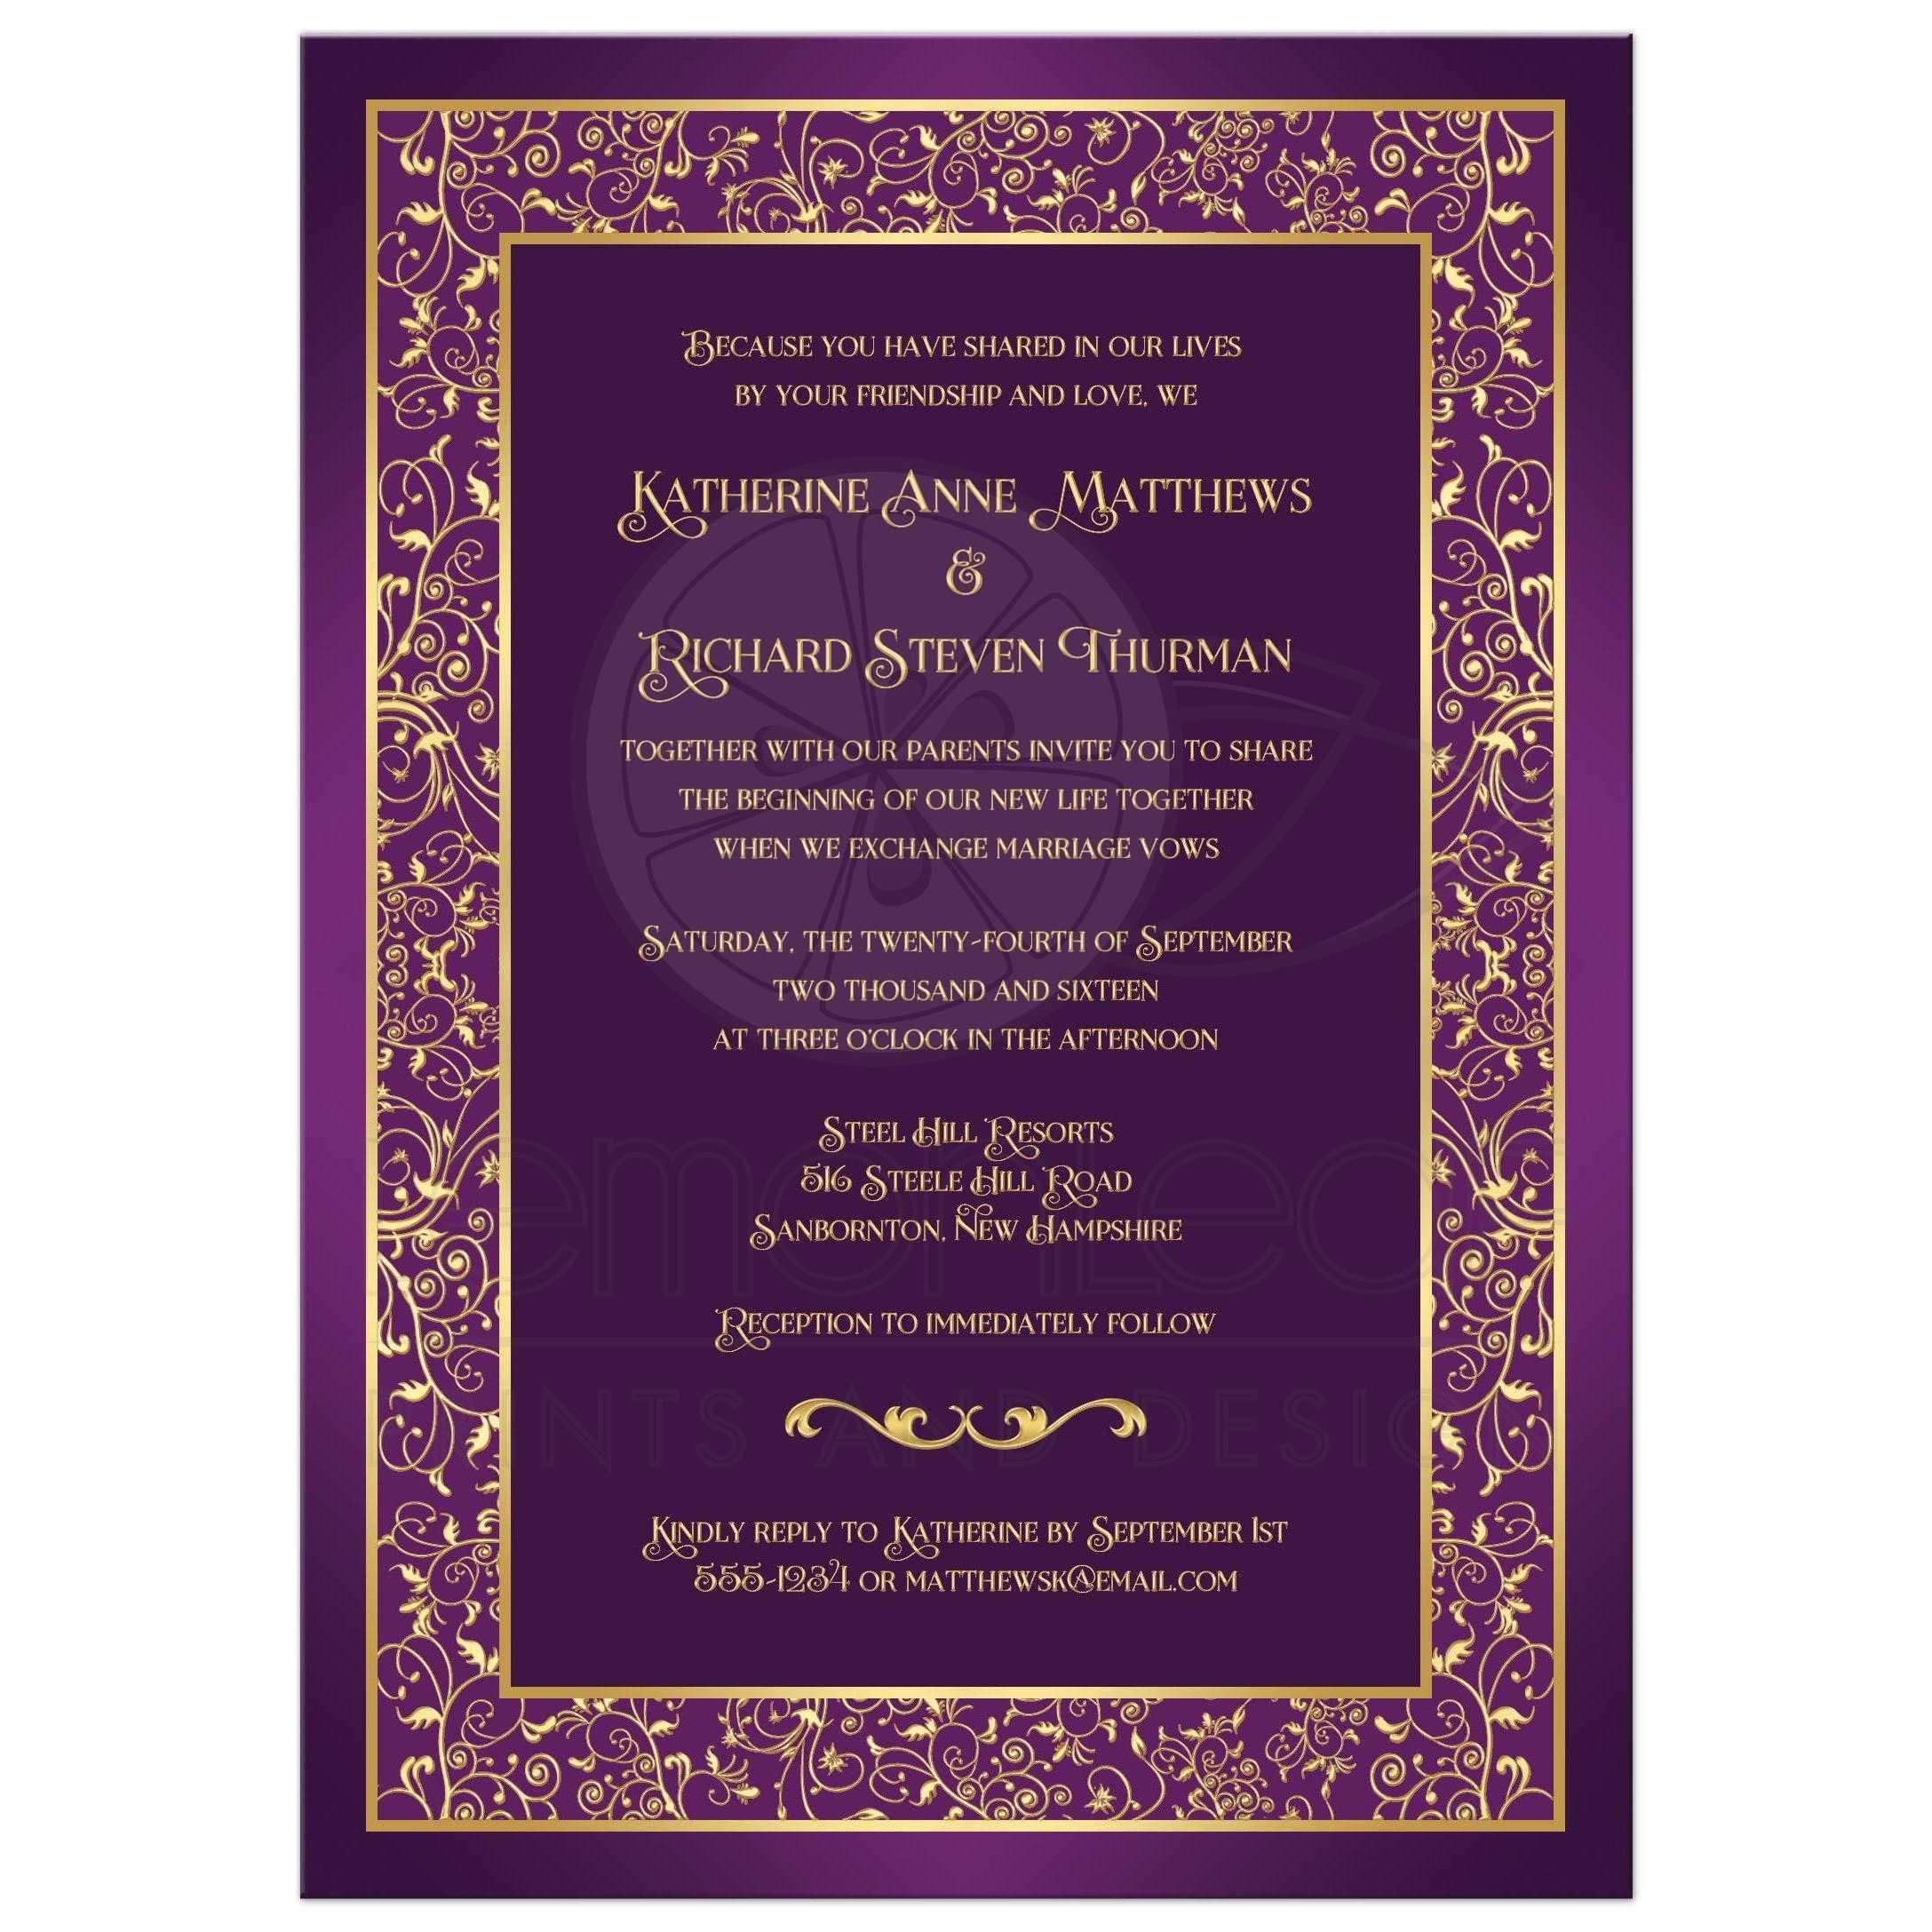 purple and gold wedding invitations purple and gold wedding Wedding Invitation Purple Gold Ornate Scrolls Vines